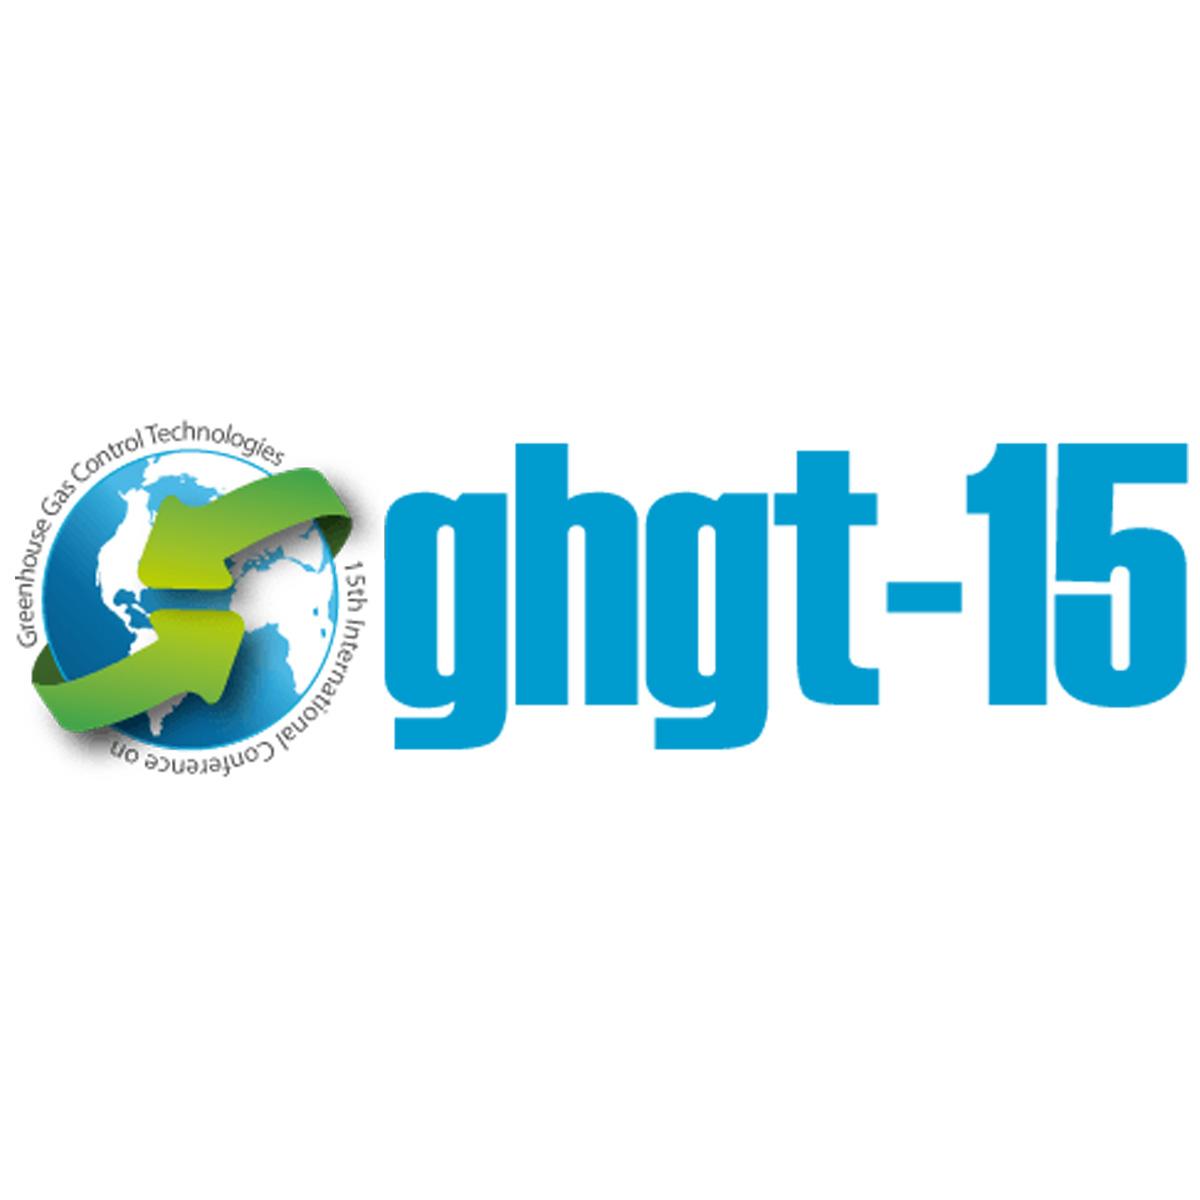 15th international conference green gas control technologies logo